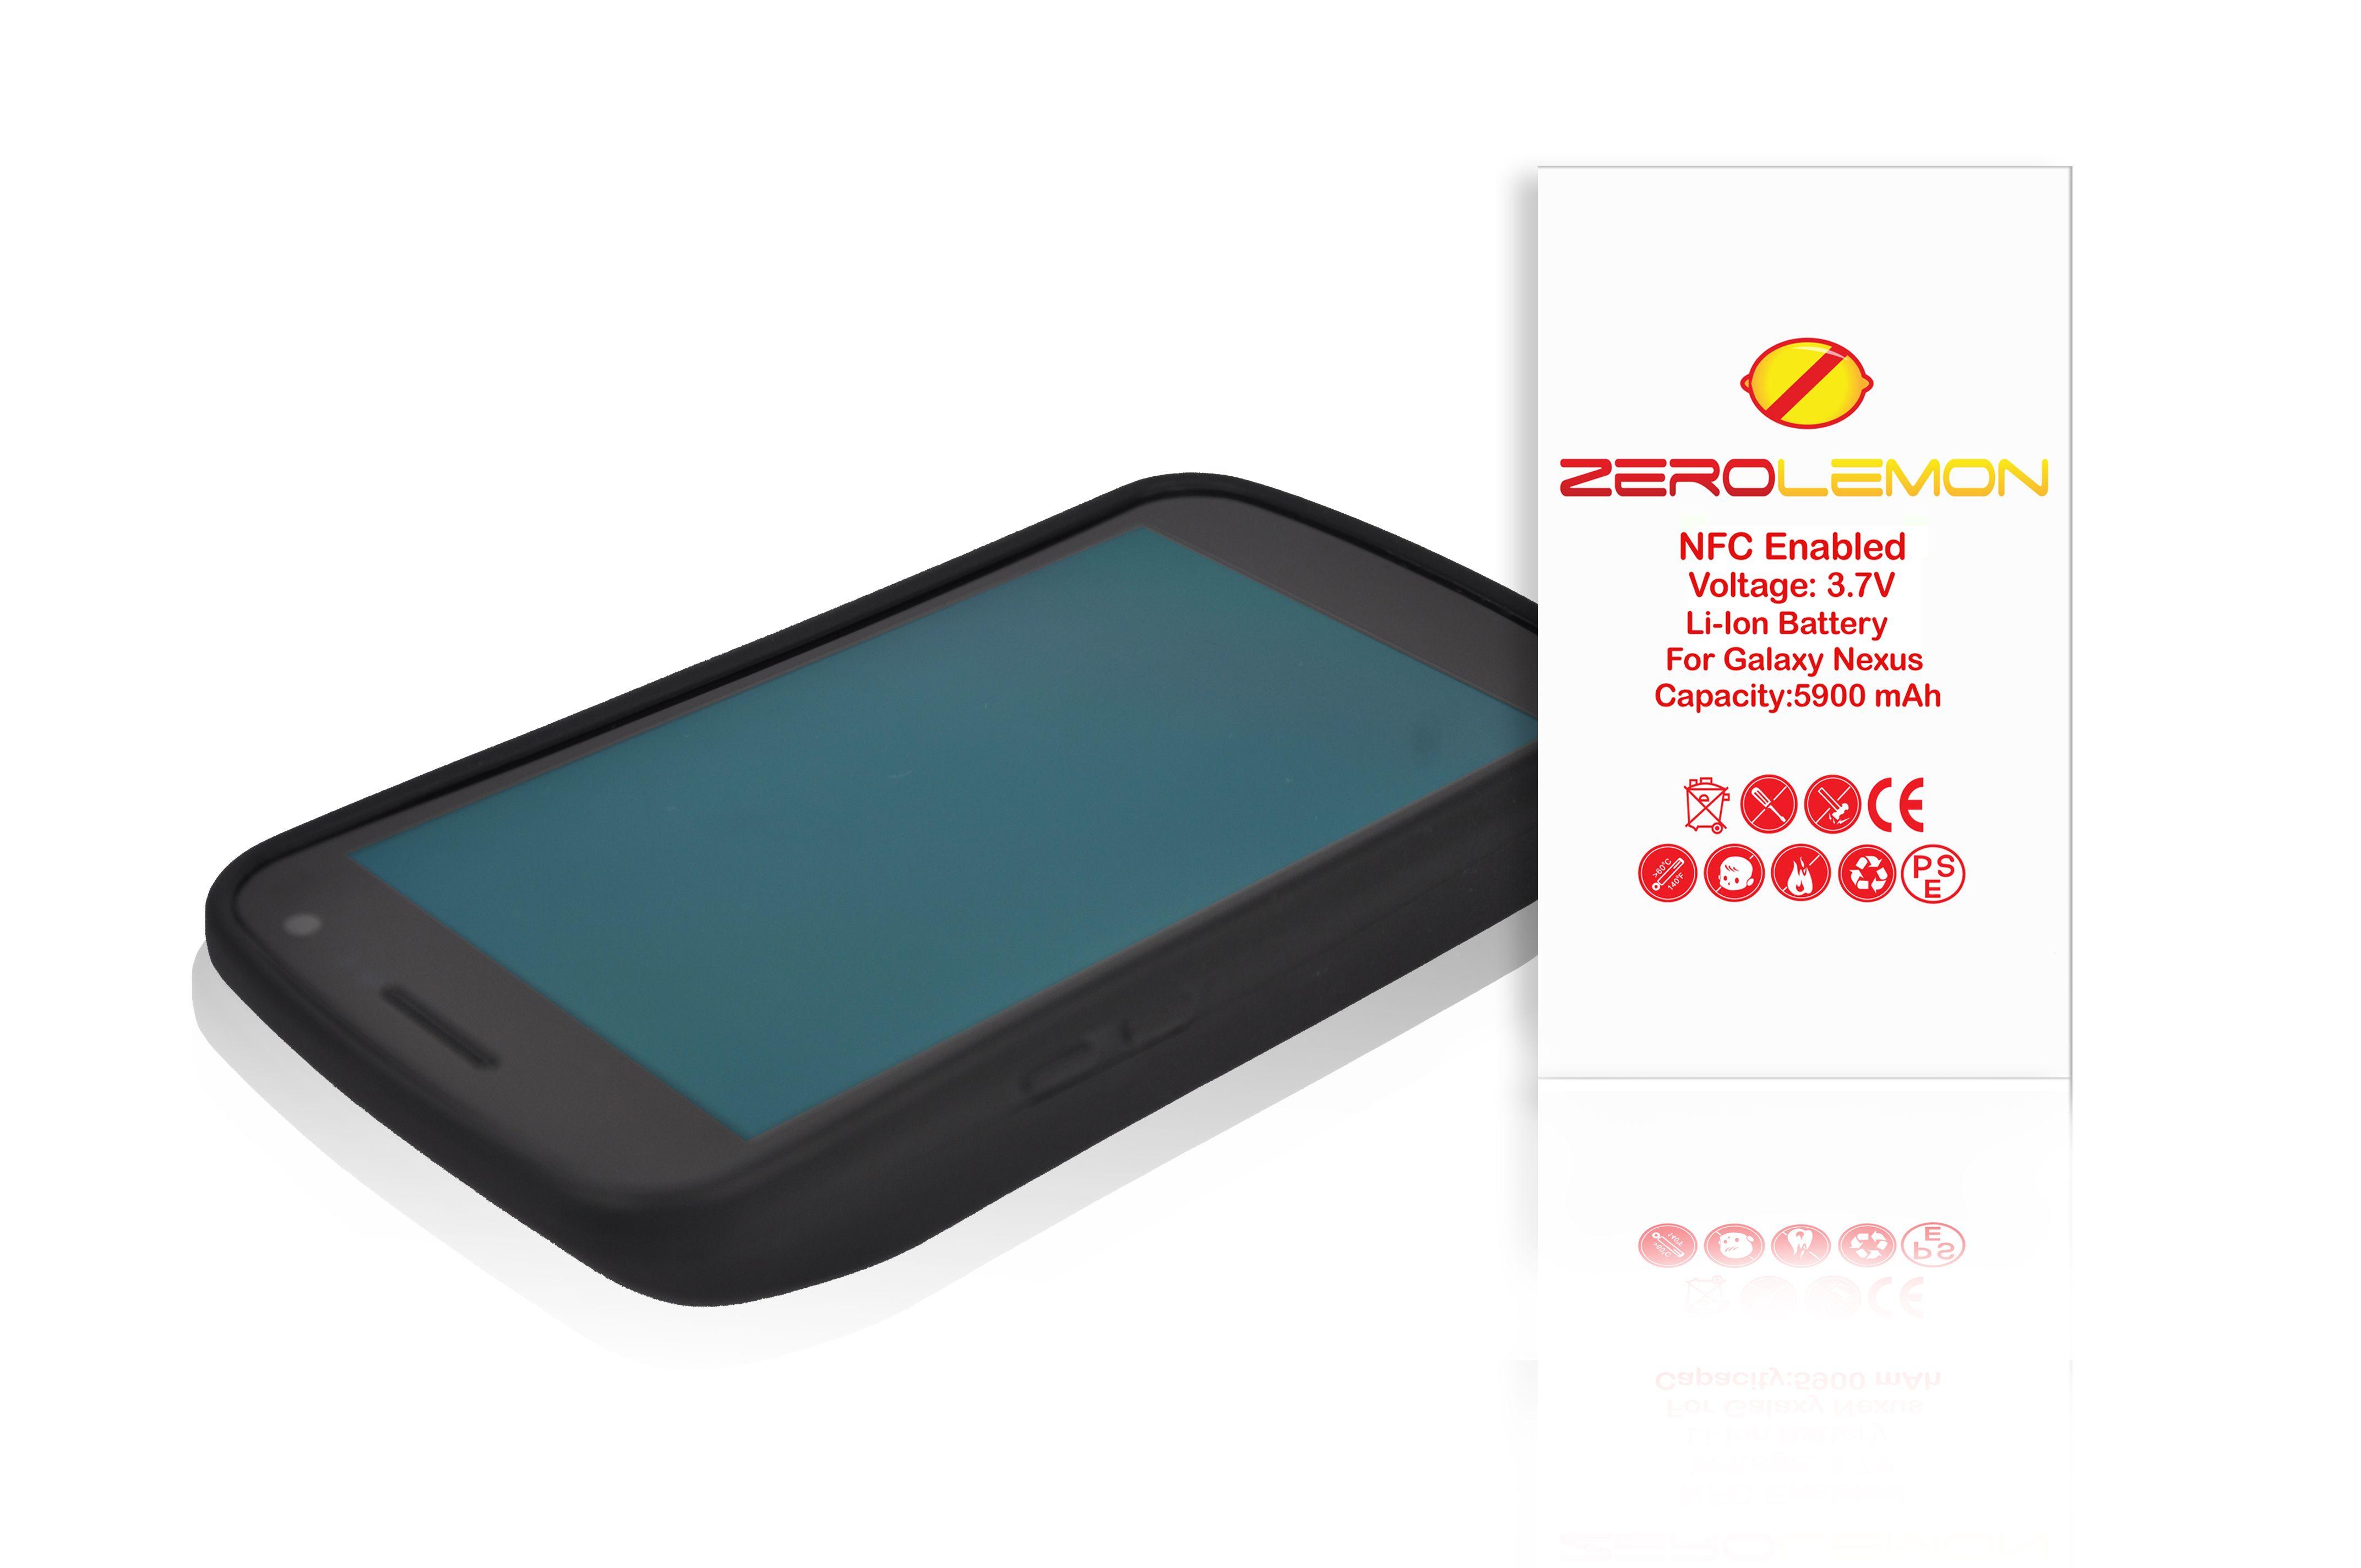 brand new a3d79 eb9dc ZeroLemon Samsung Galaxy Nexus 5900mAh Extended Battery + Free Black ...